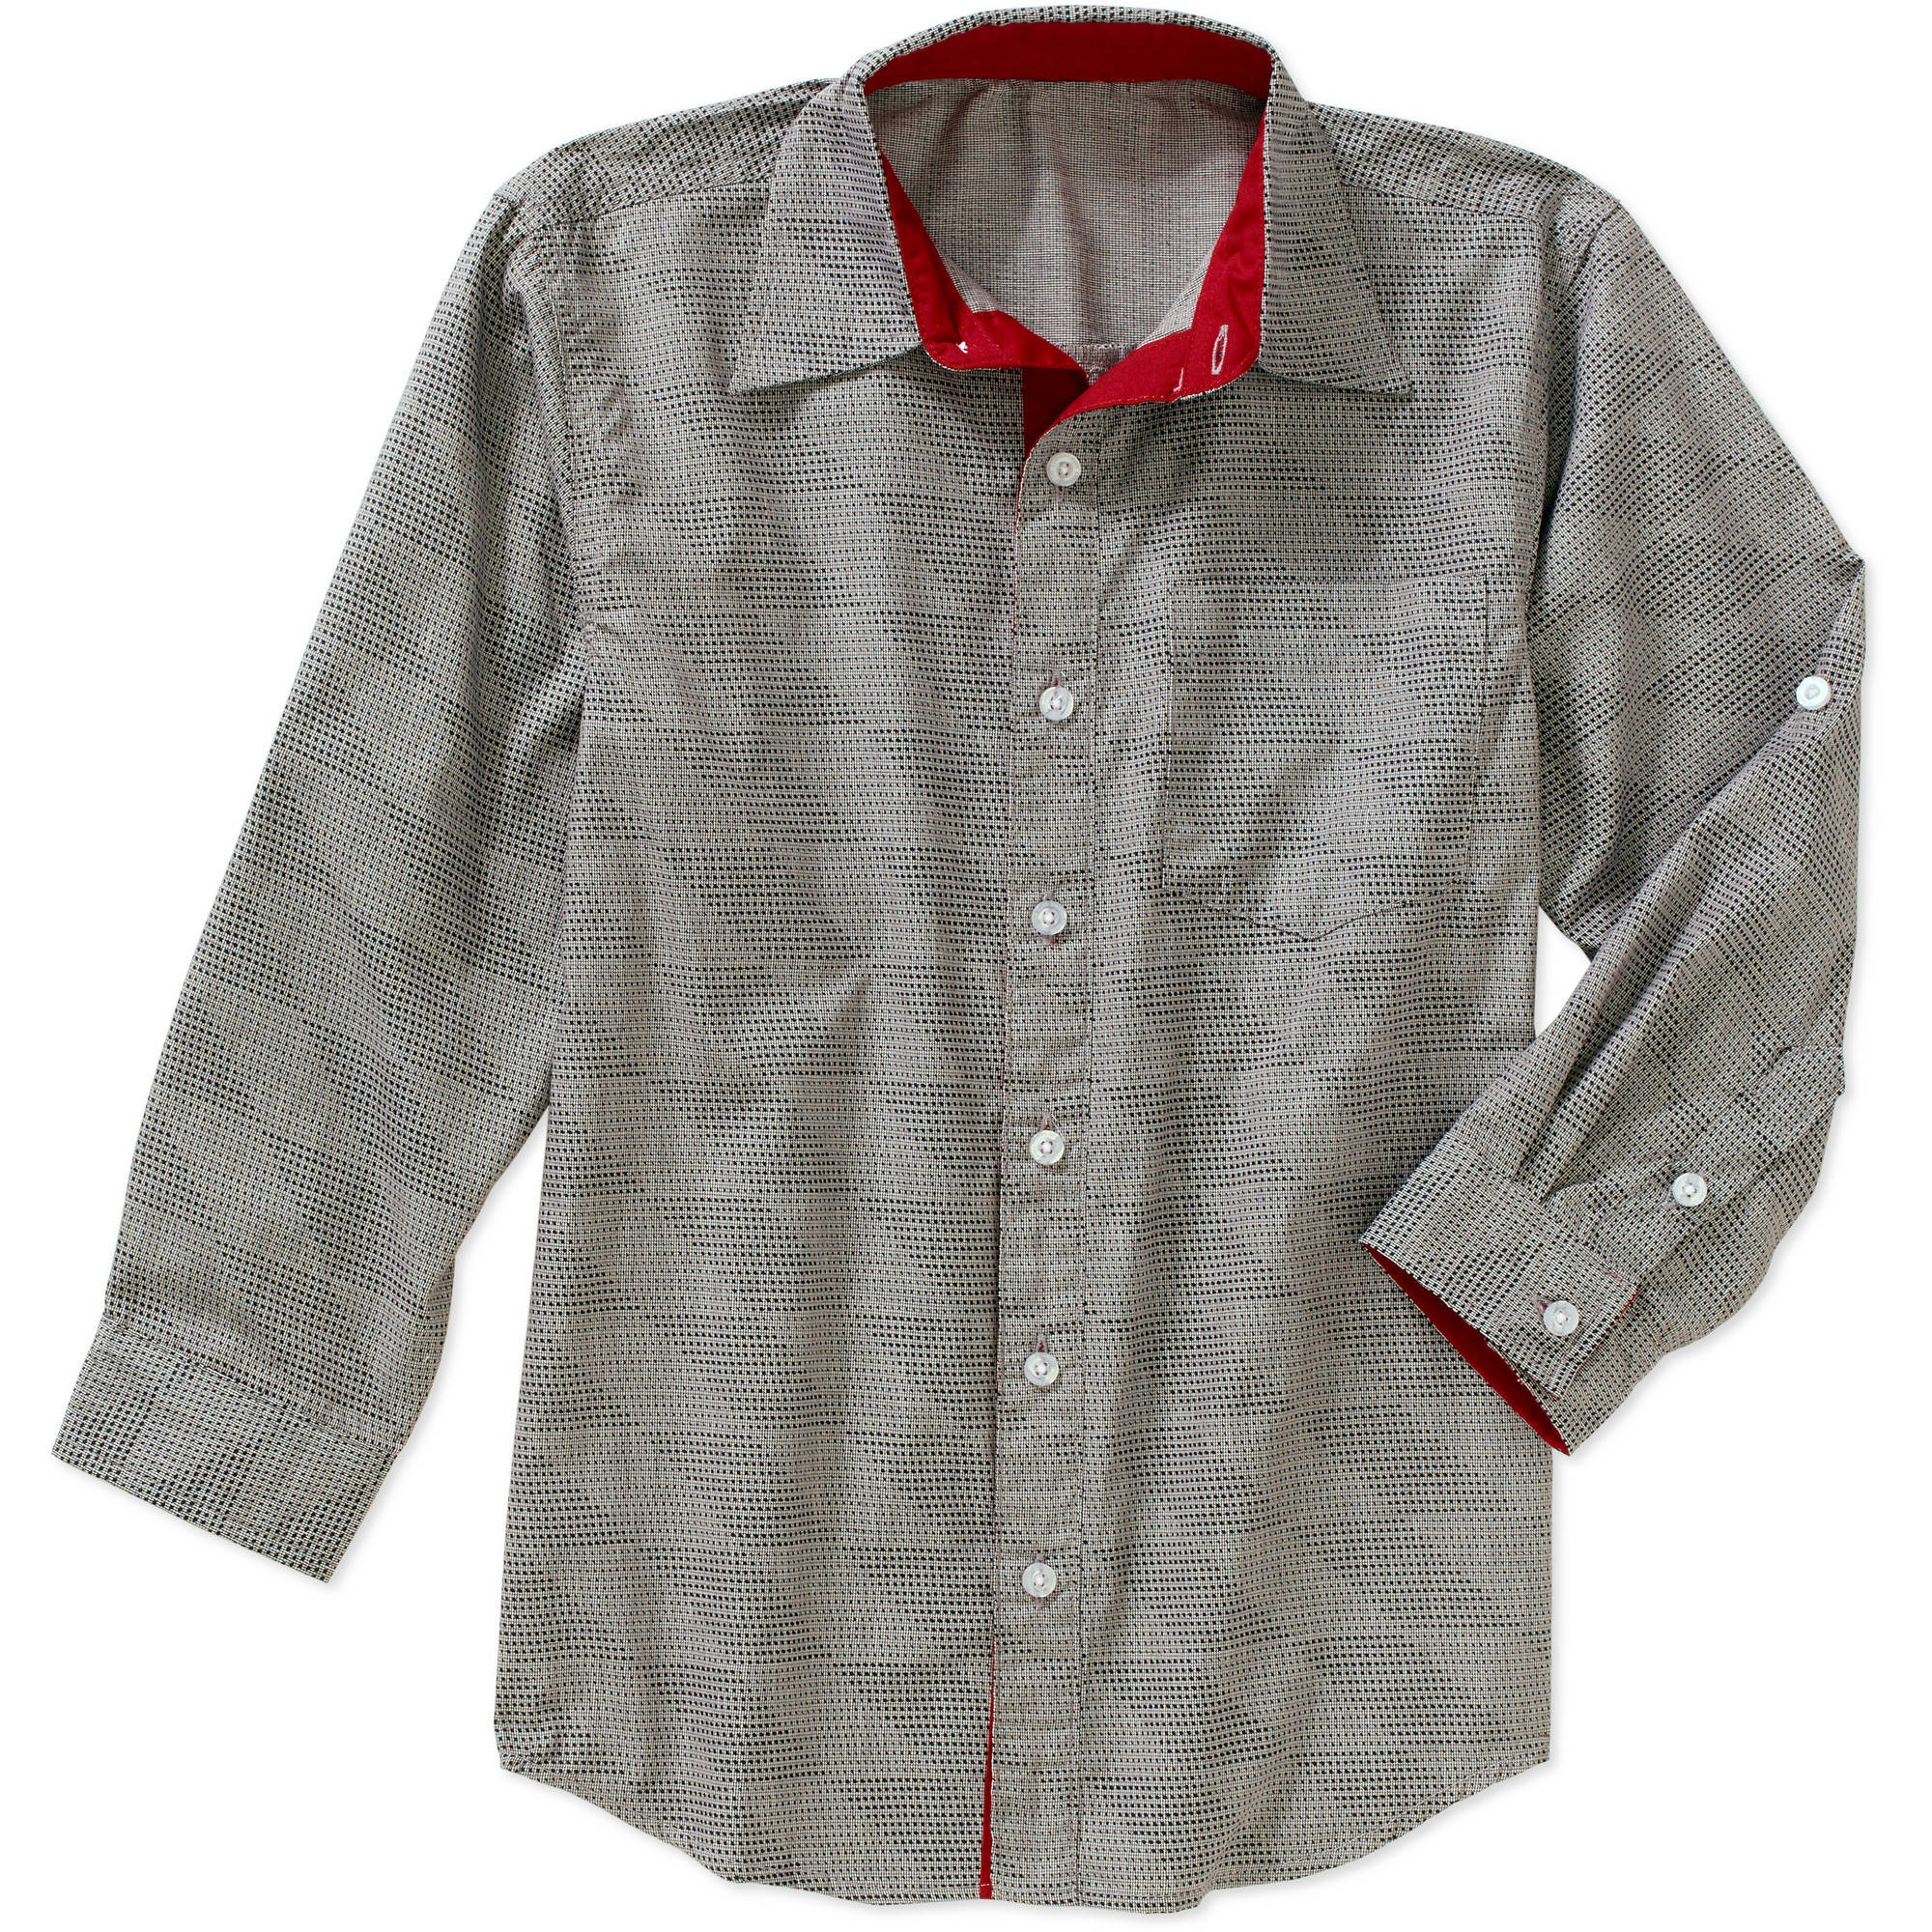 American Hawk Boys' Long Sleeve Woven Shirt